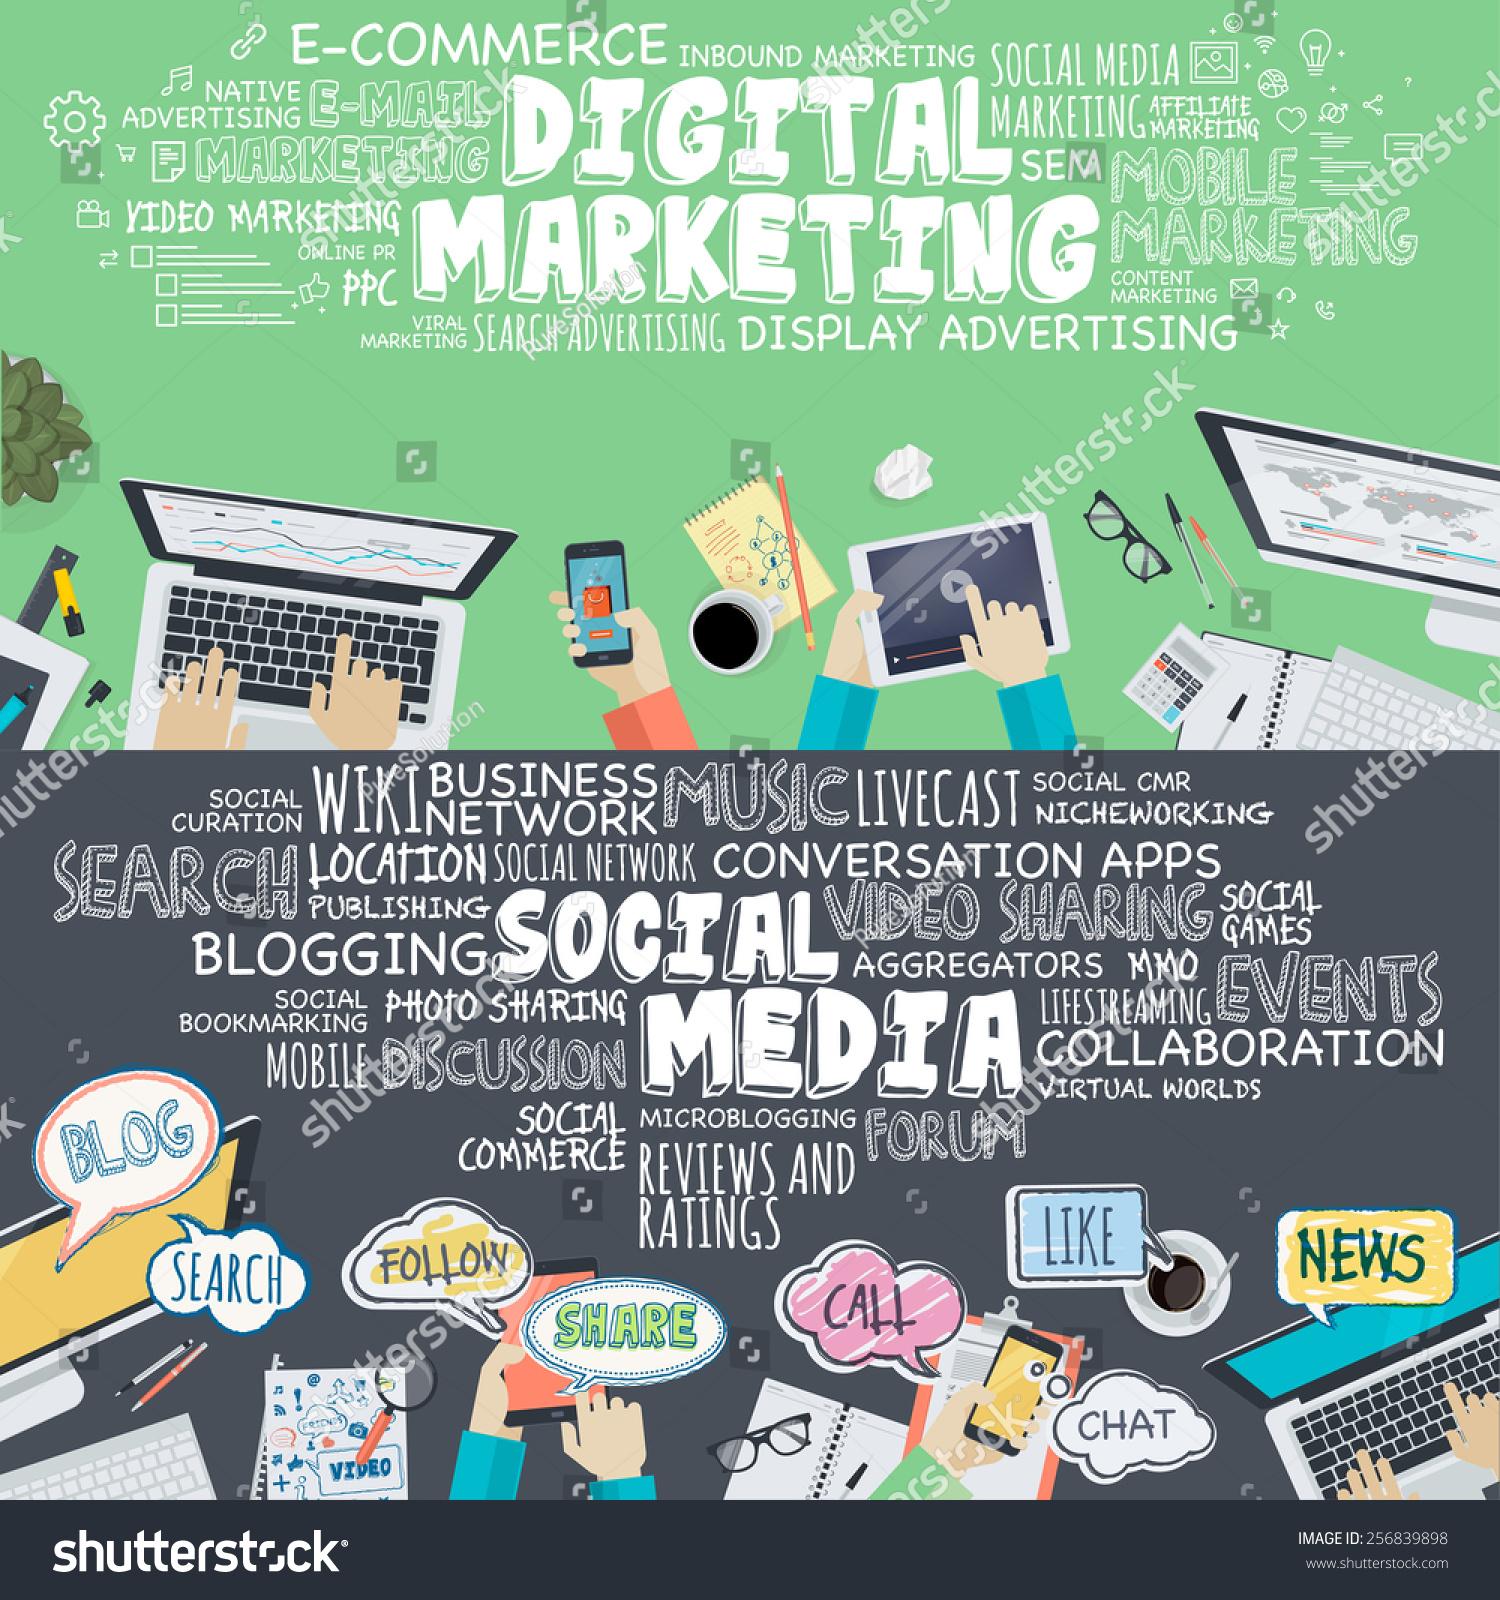 Online image photo editor shutterstock editor for Digital marketing materials